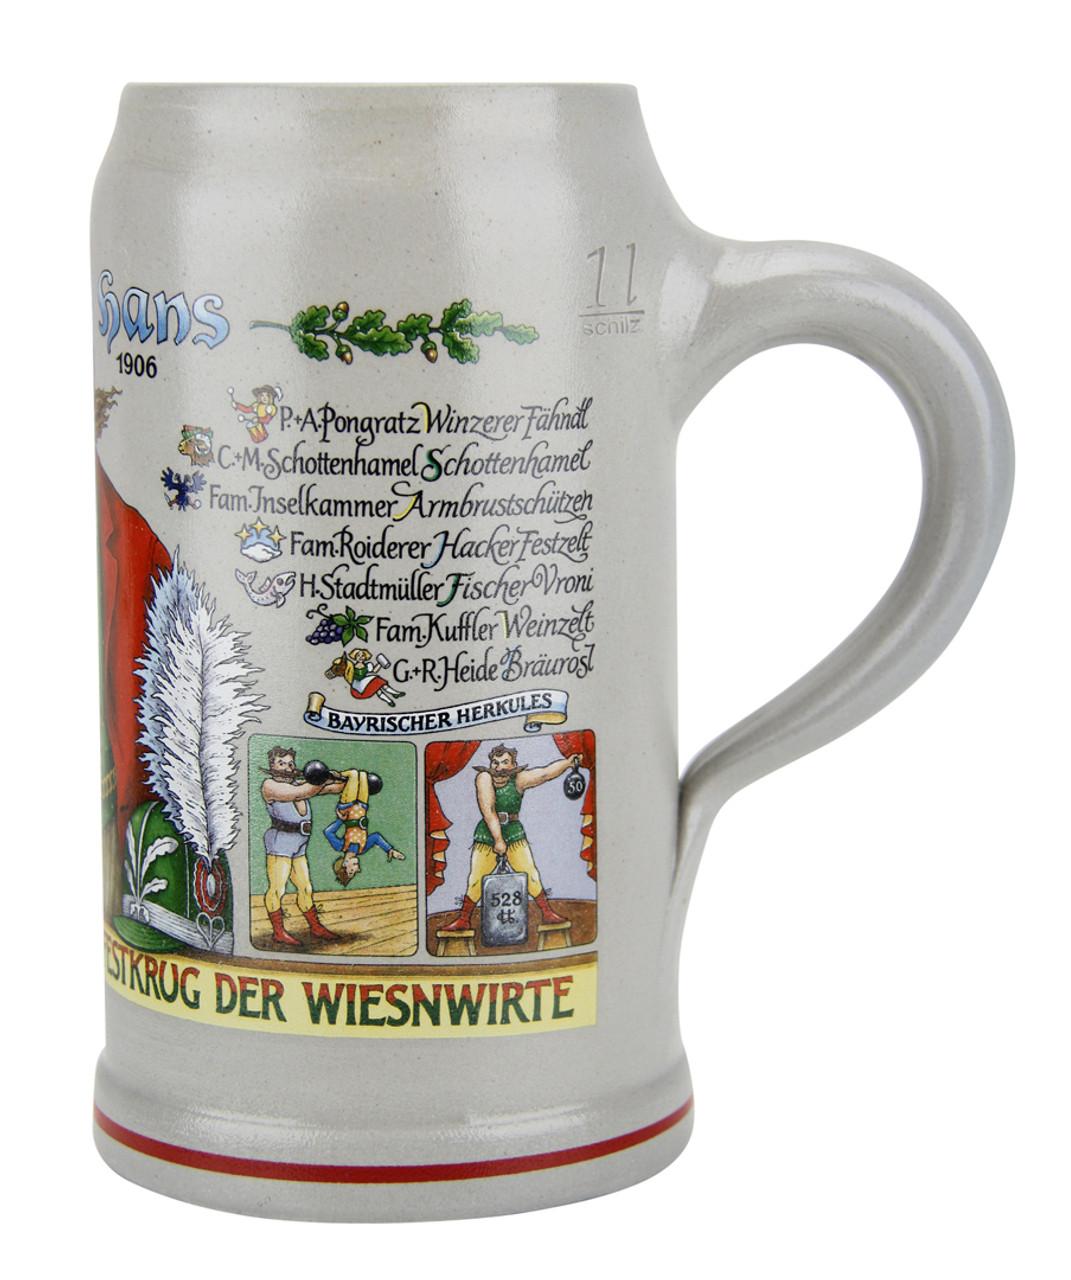 Oktoberfest Wirtekrug Ceramic Beer Mug